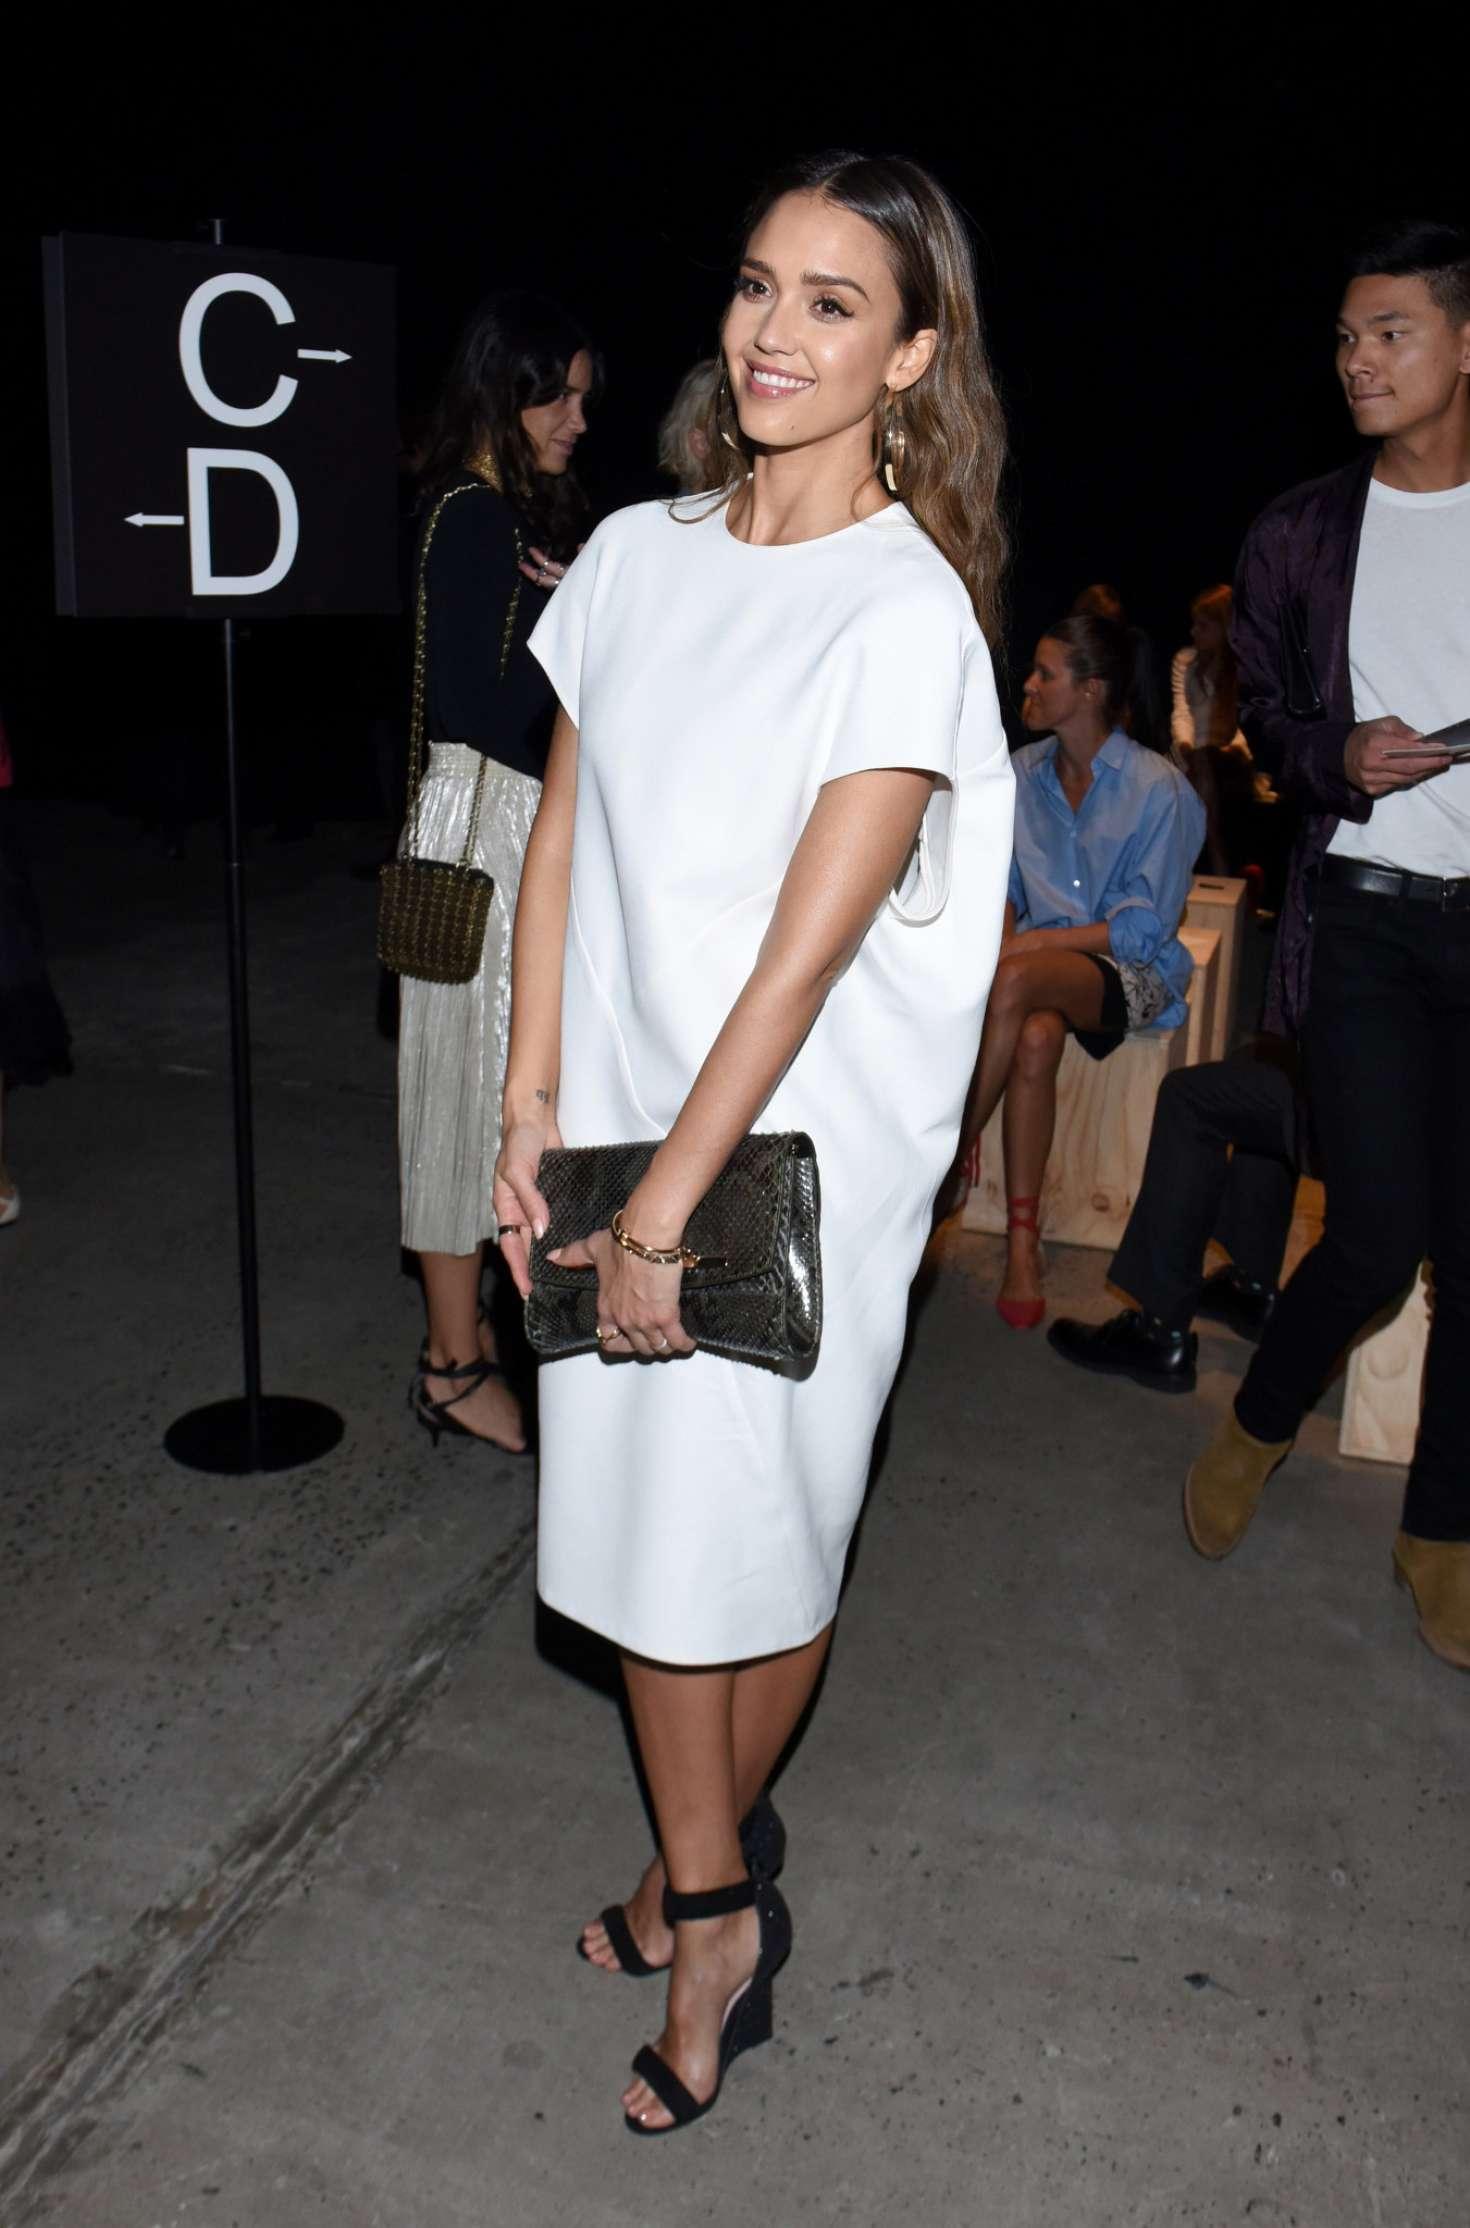 Jessica Alba - Narciso Rodriguez at 2016 New York Fashion Week in NYC